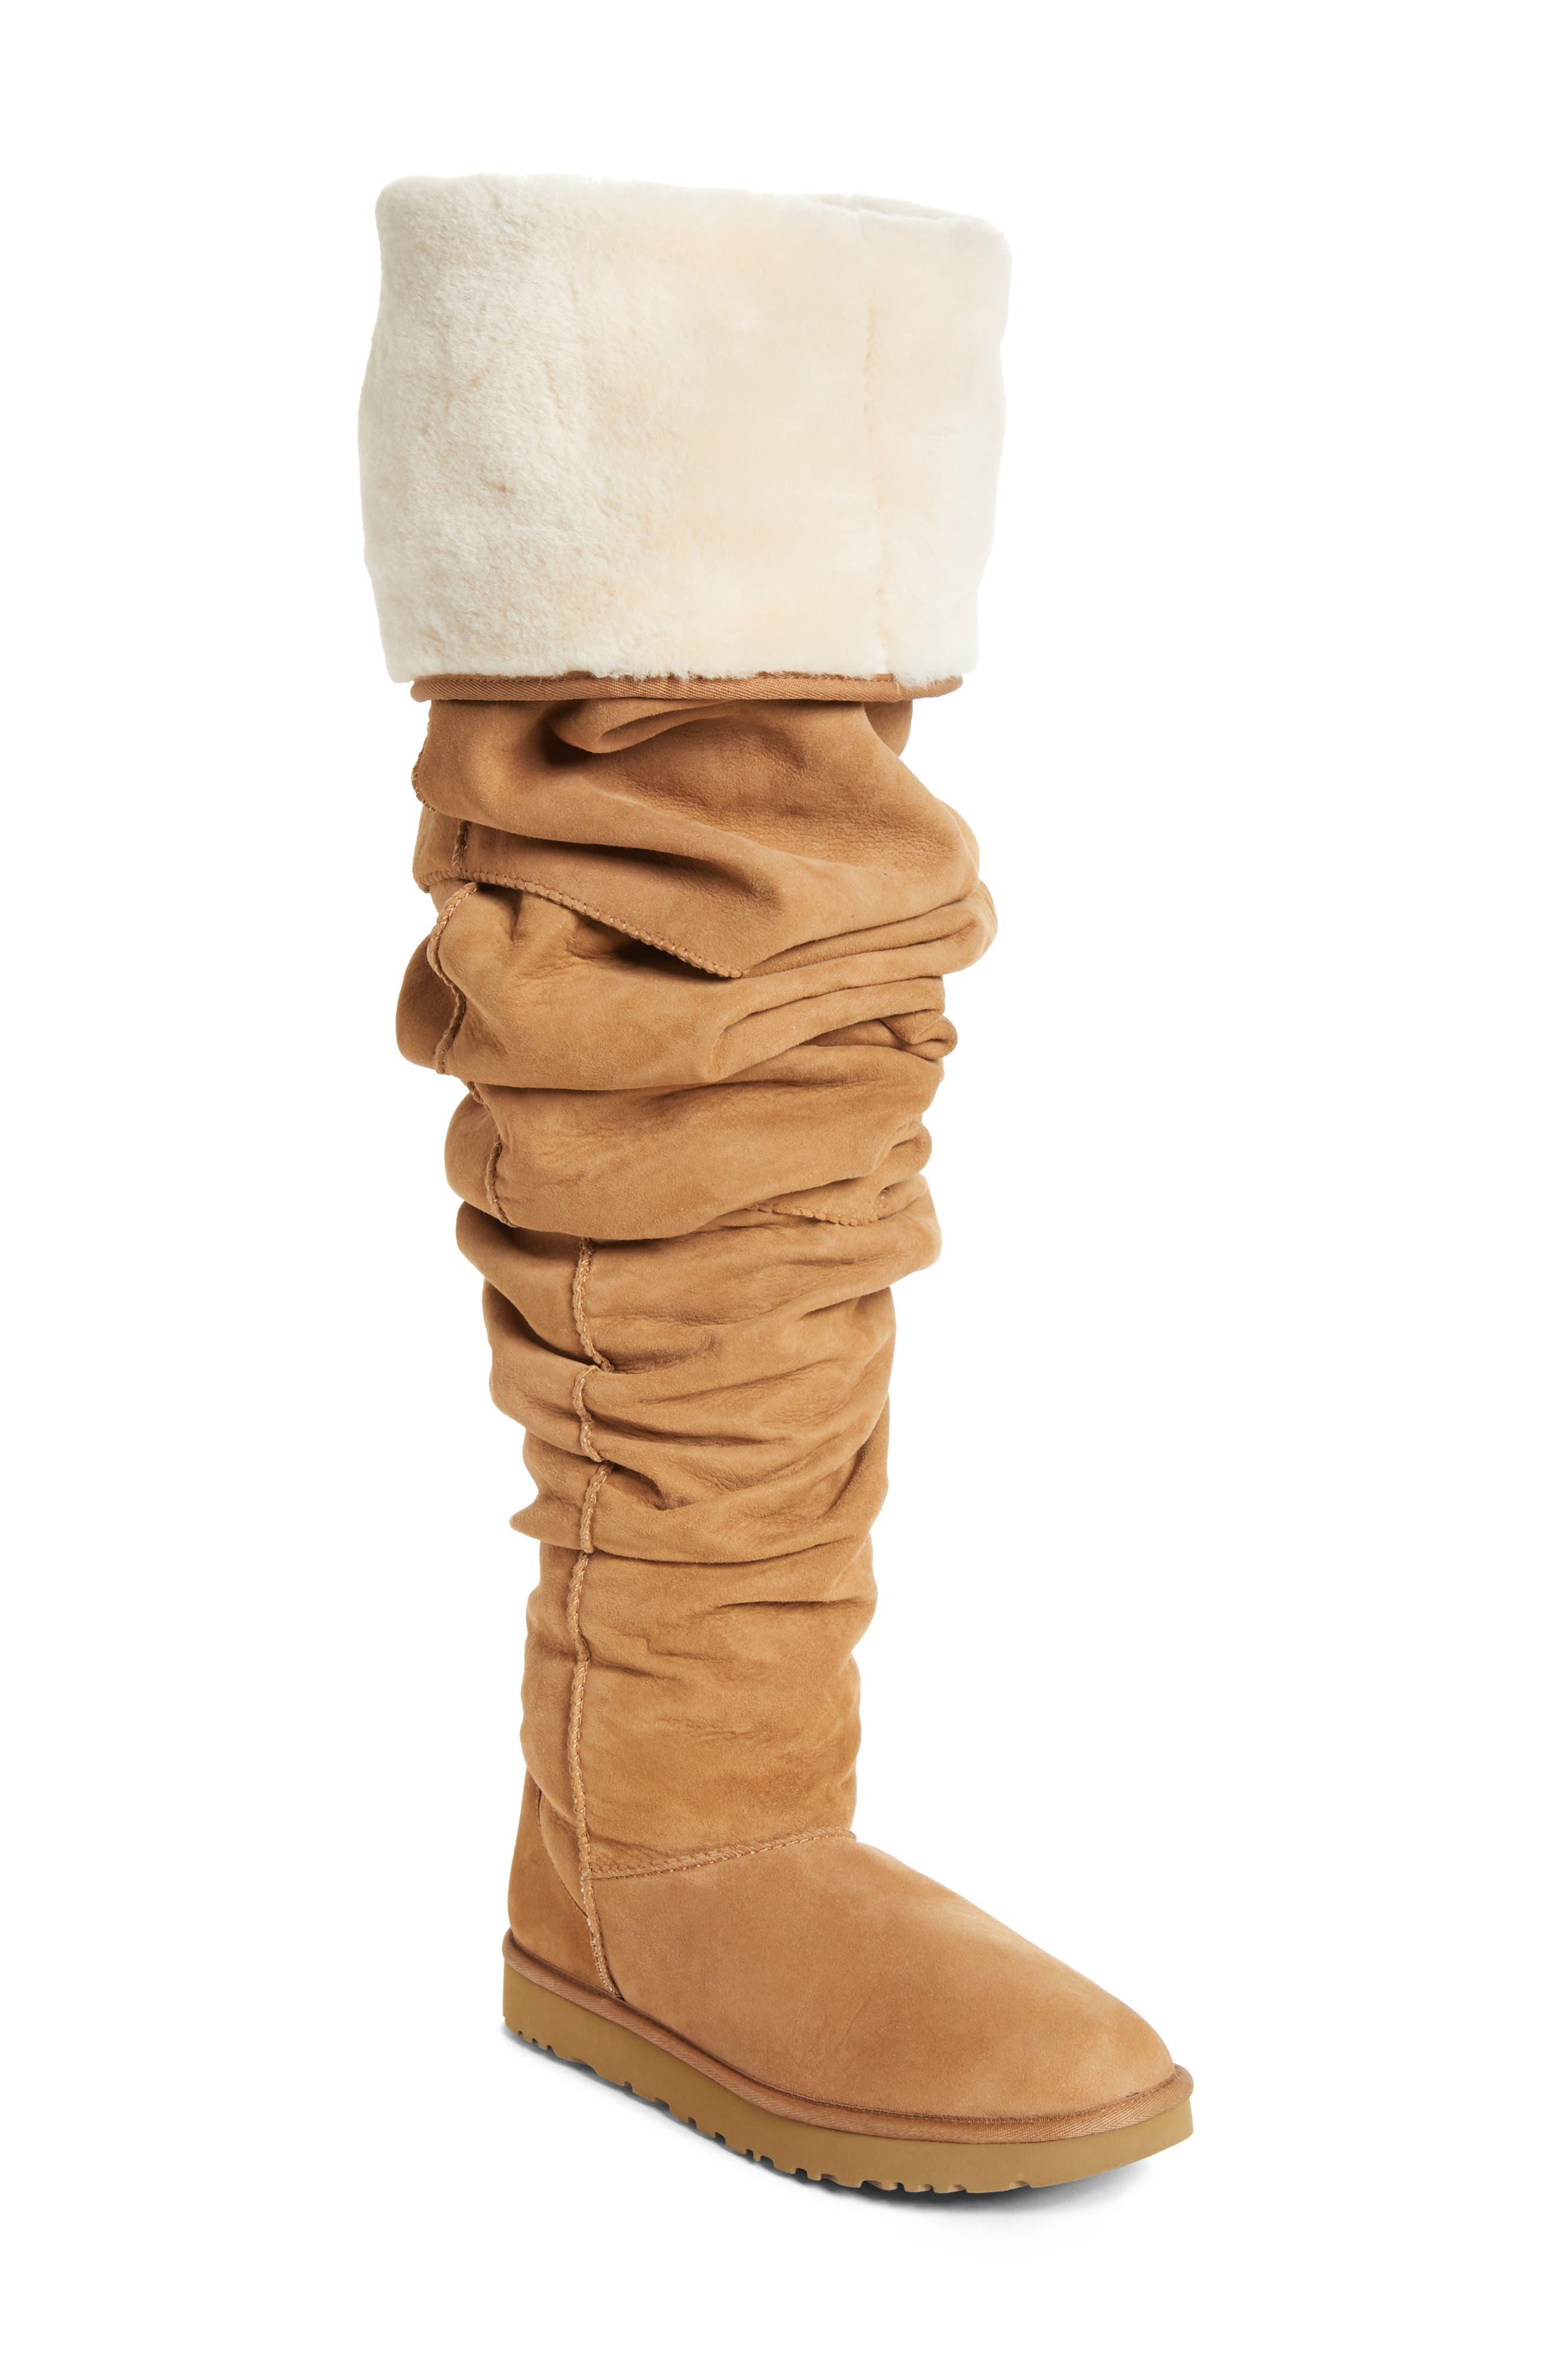 x UGG<sup>®</sup> Thigh High Boot,                         Main,                         color, BROWN